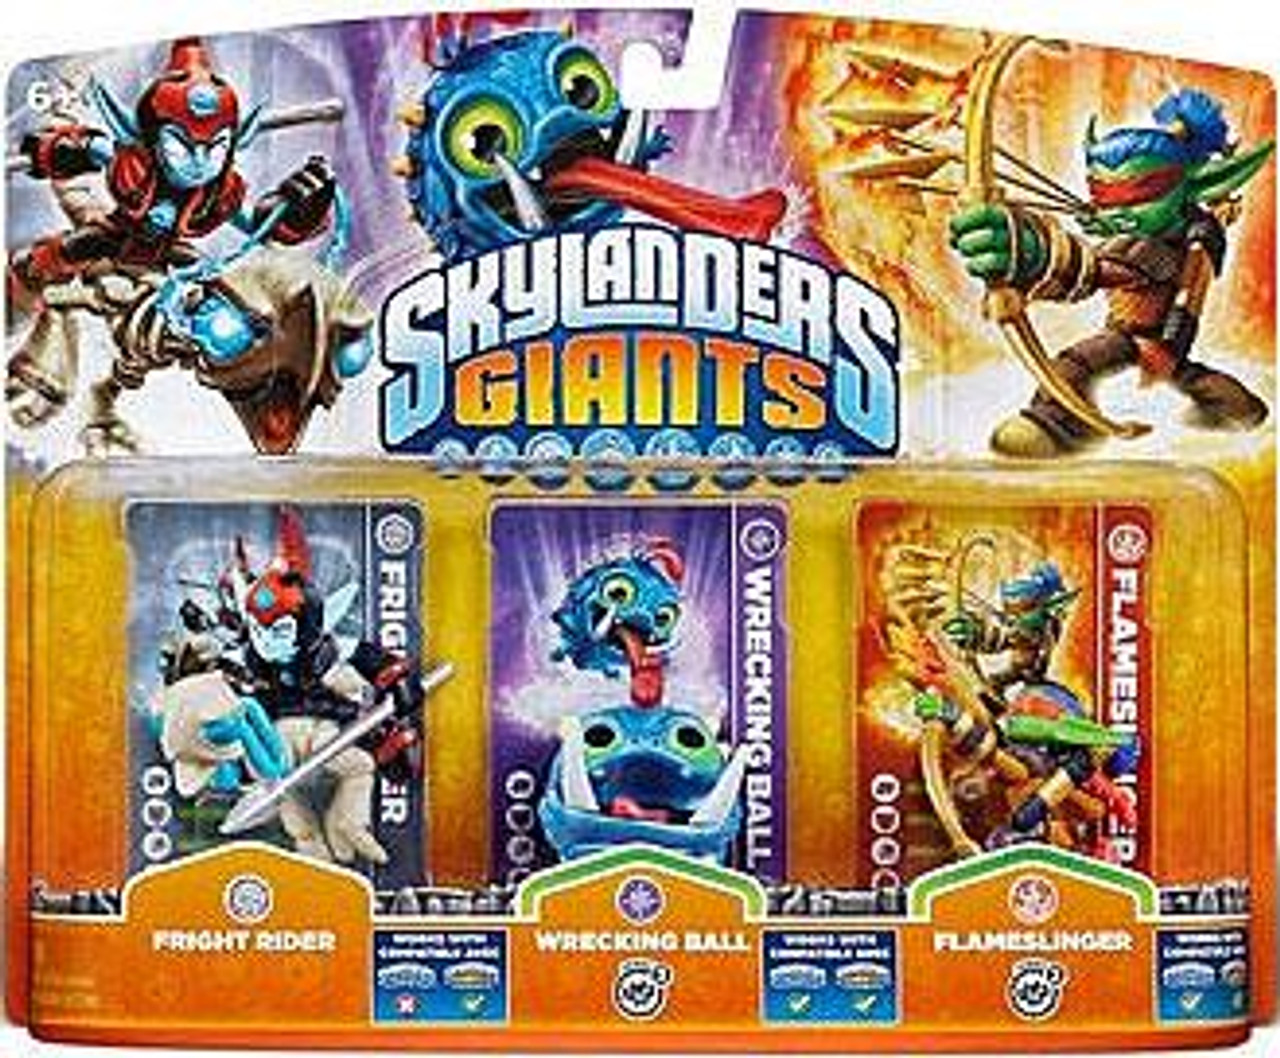 Skylanders Giants Fright Rider, Wrecking Ball & Flameslinger Figure 3-Pack